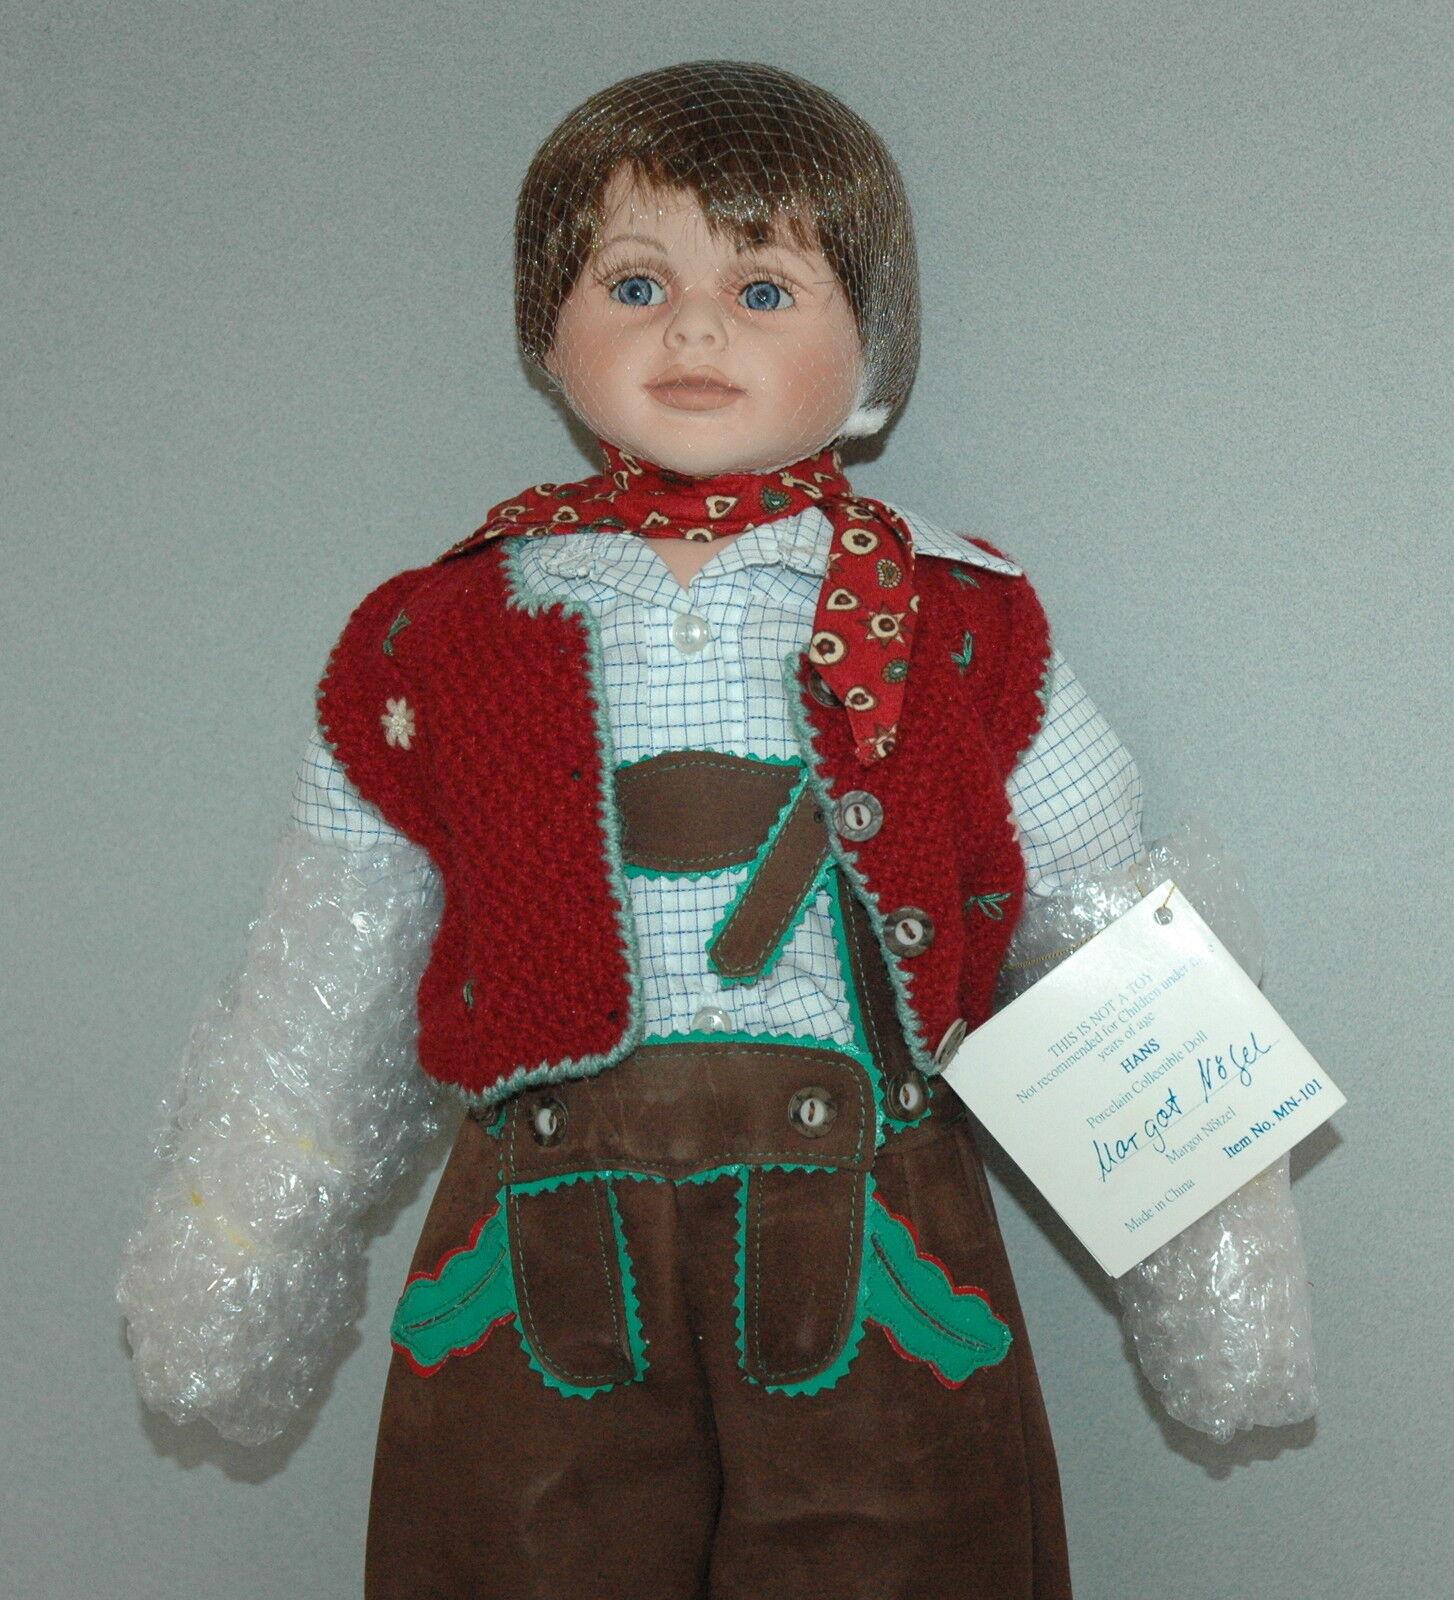 Premiere Artist Collection 22  Porcelain Doll Hans By Margot Notze LTD ED NIB